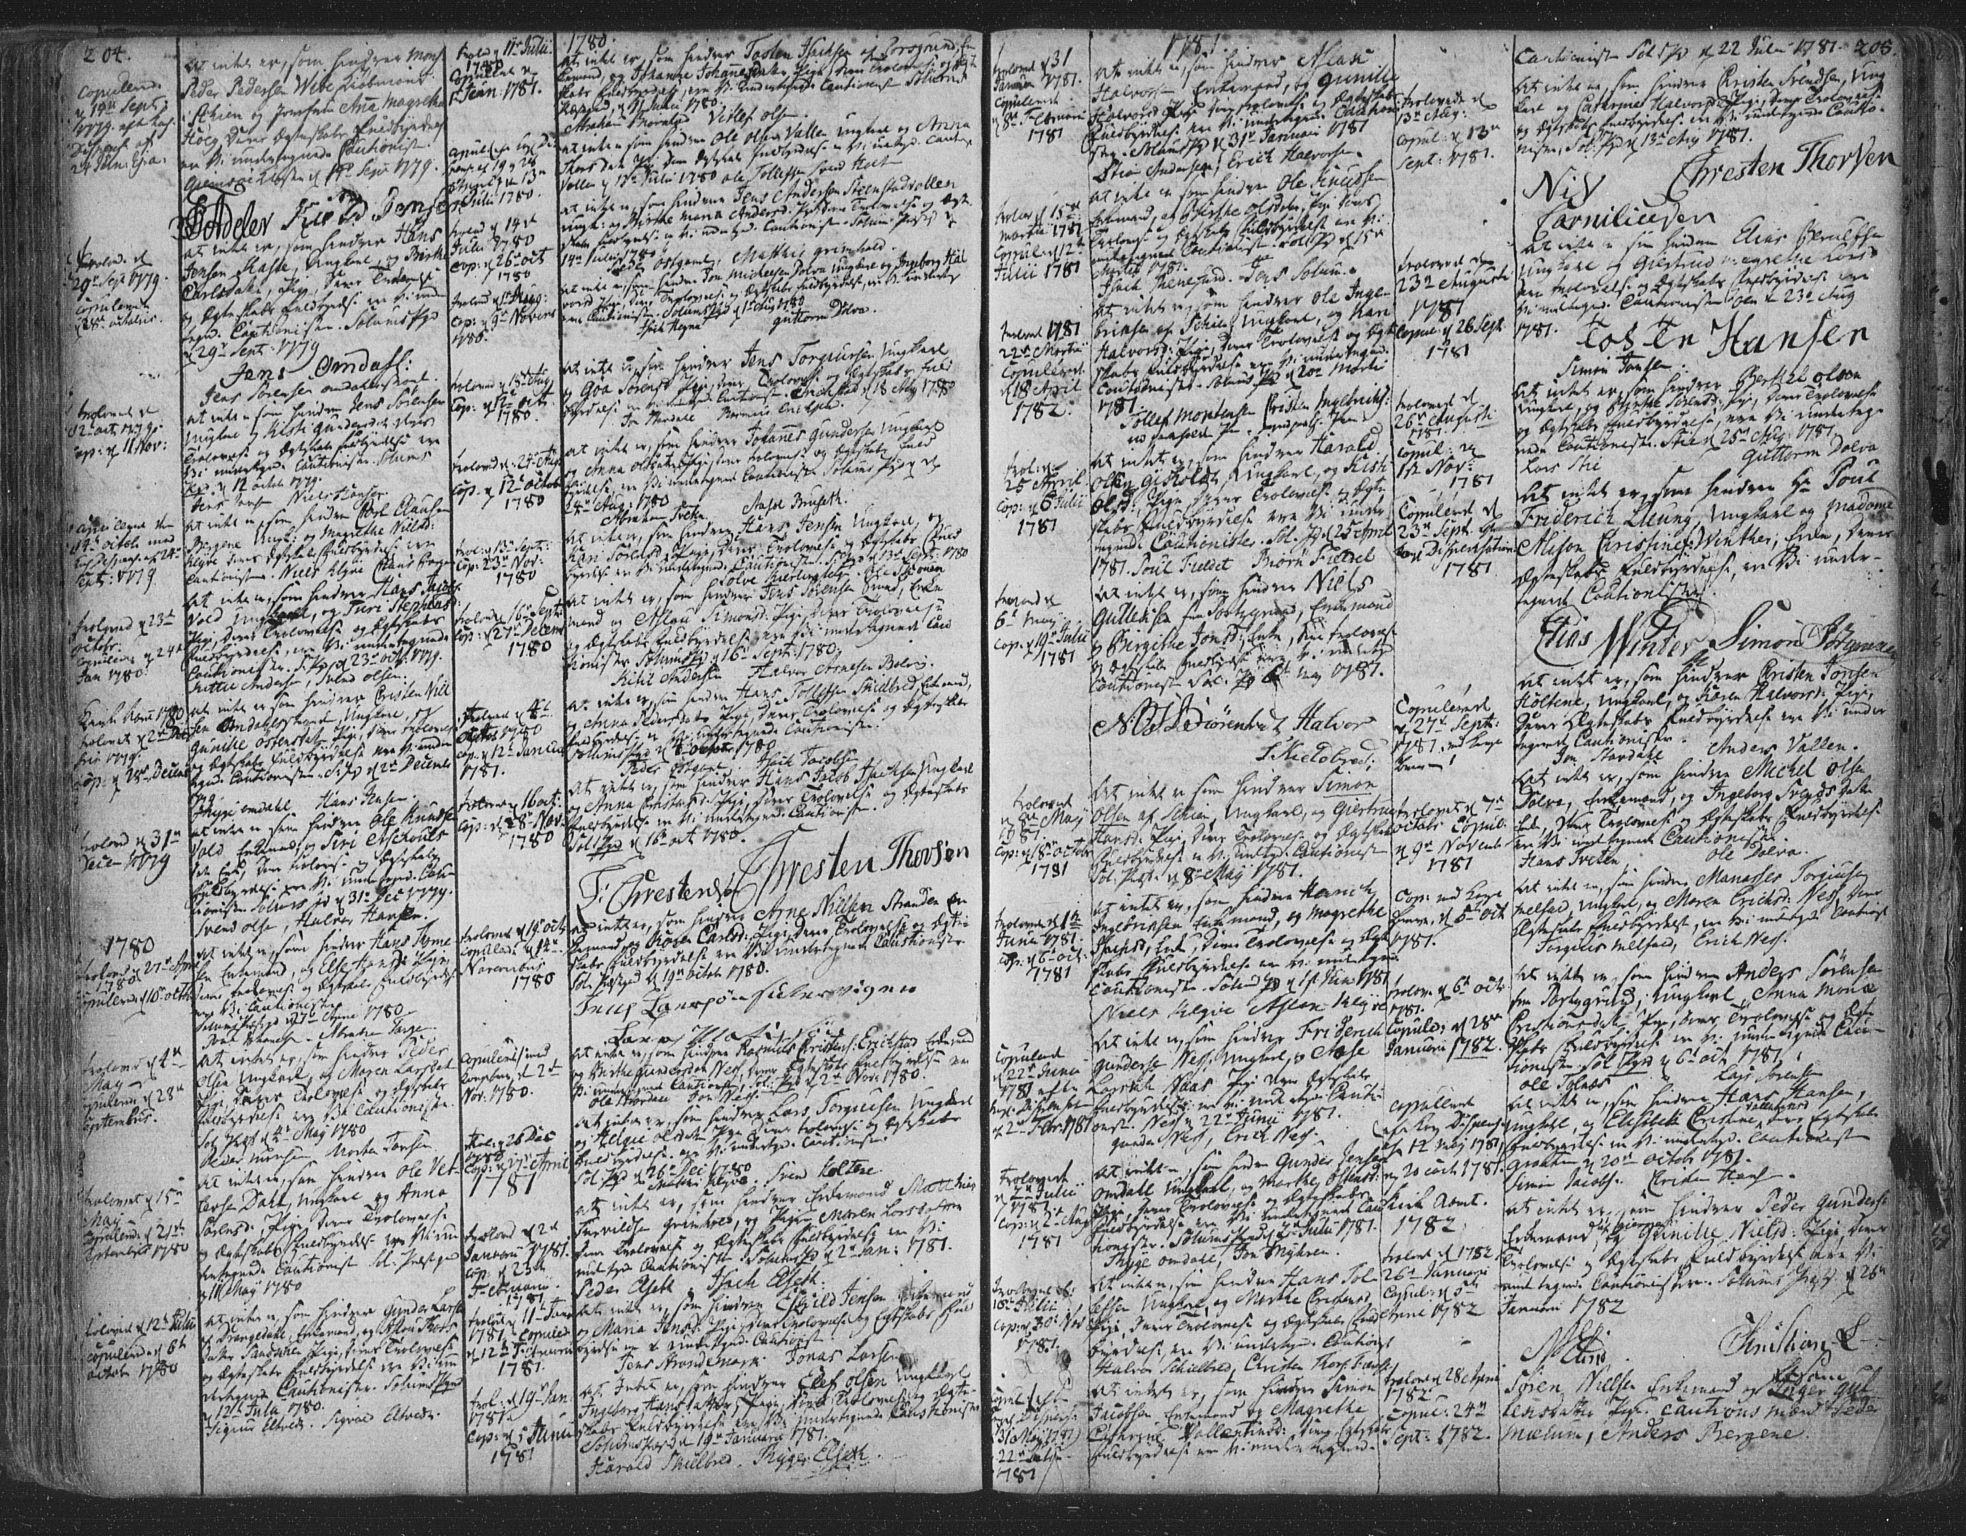 SAKO, Solum kirkebøker, F/Fa/L0003: Ministerialbok nr. I 3, 1761-1814, s. 204-205